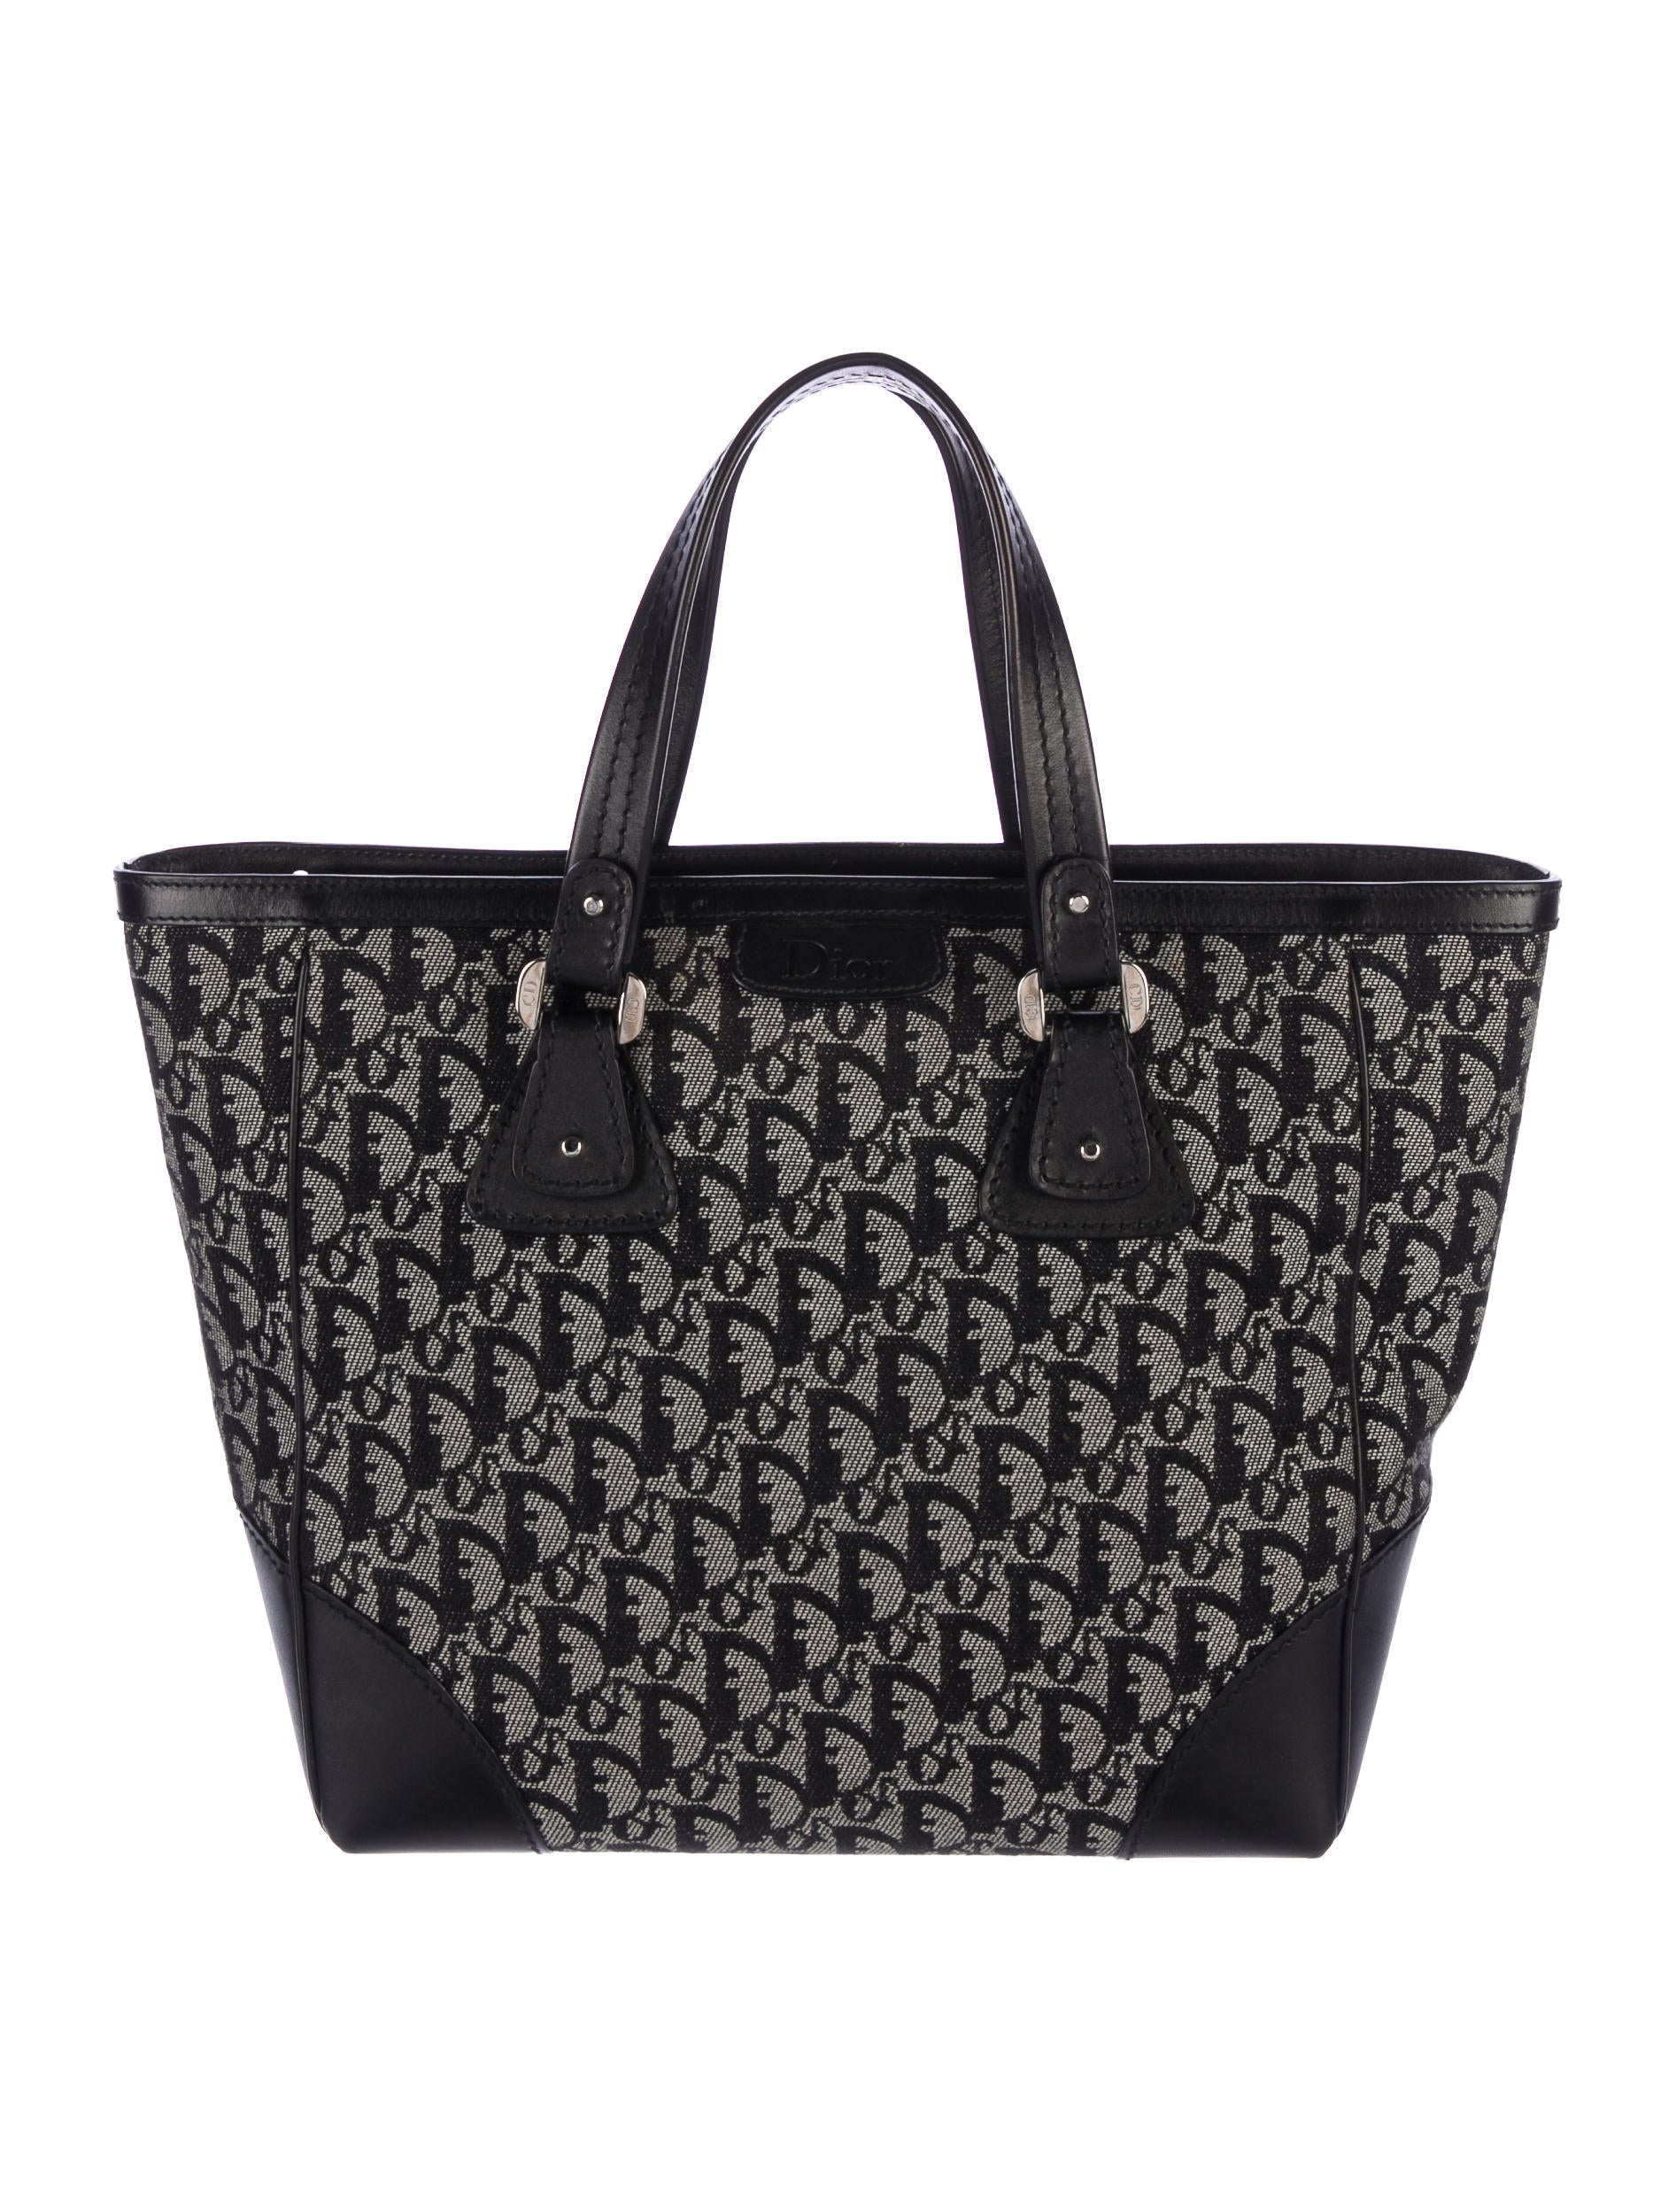 a569e100ec2f Christian Dior Tote Bag Canvas Australia | Stanford Center for ...